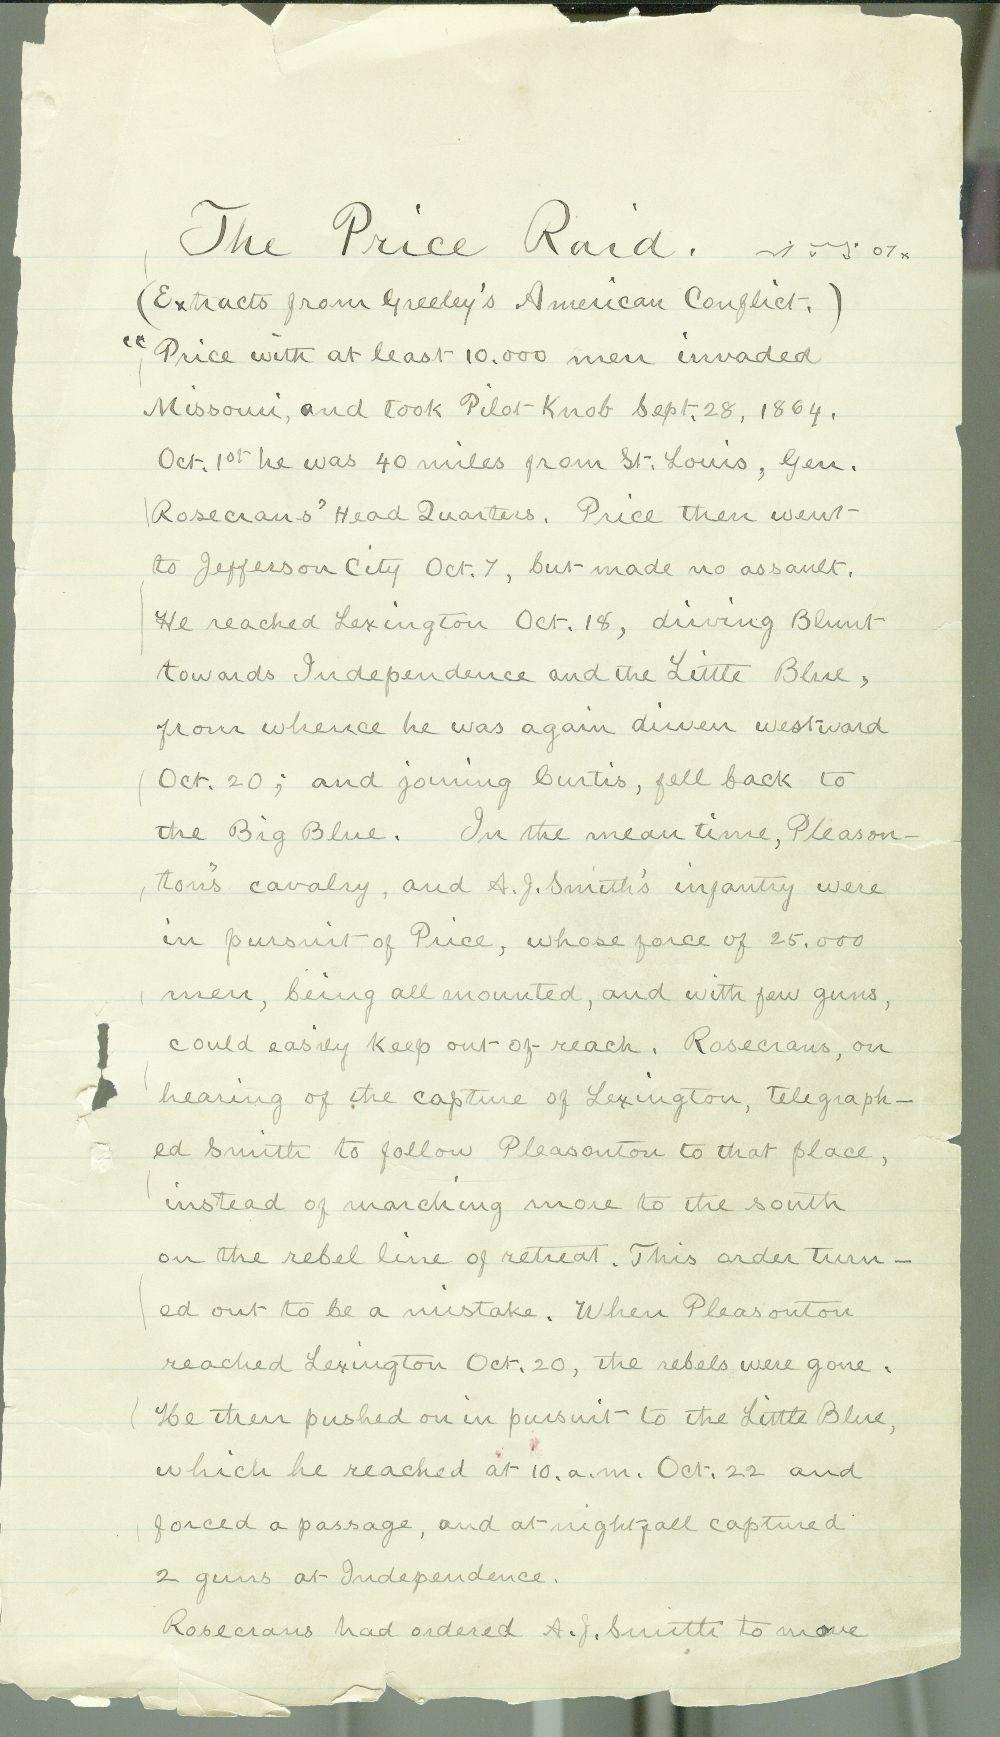 Samuel J. Reader's autobiography, volume 3 - 3